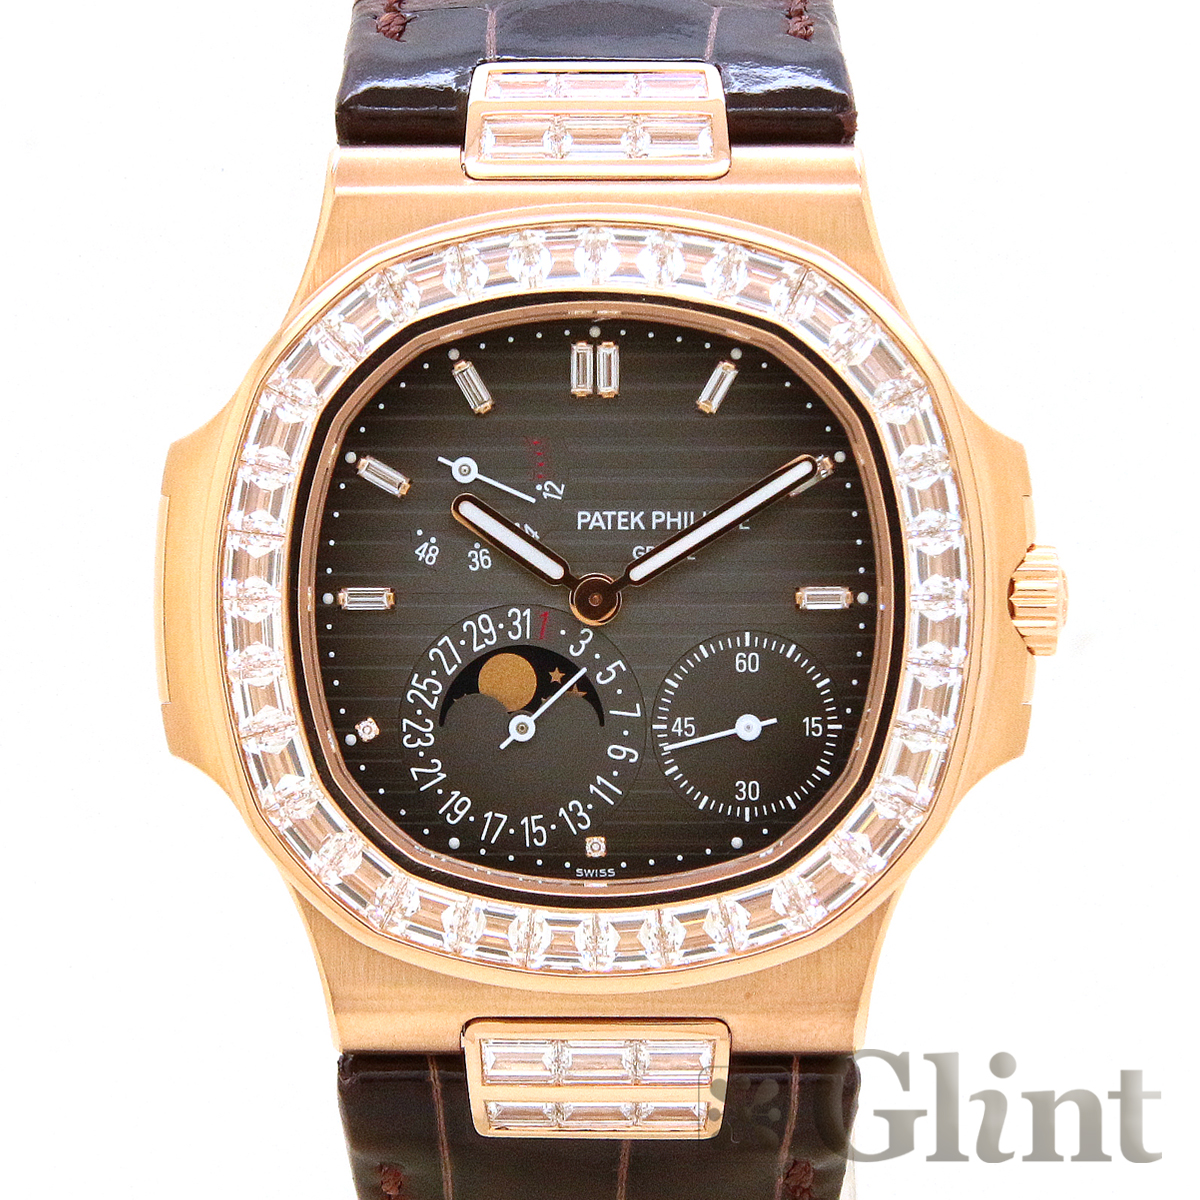 Glint Os パテックフィリップ Patek Philippe Nautilus 5724r 001